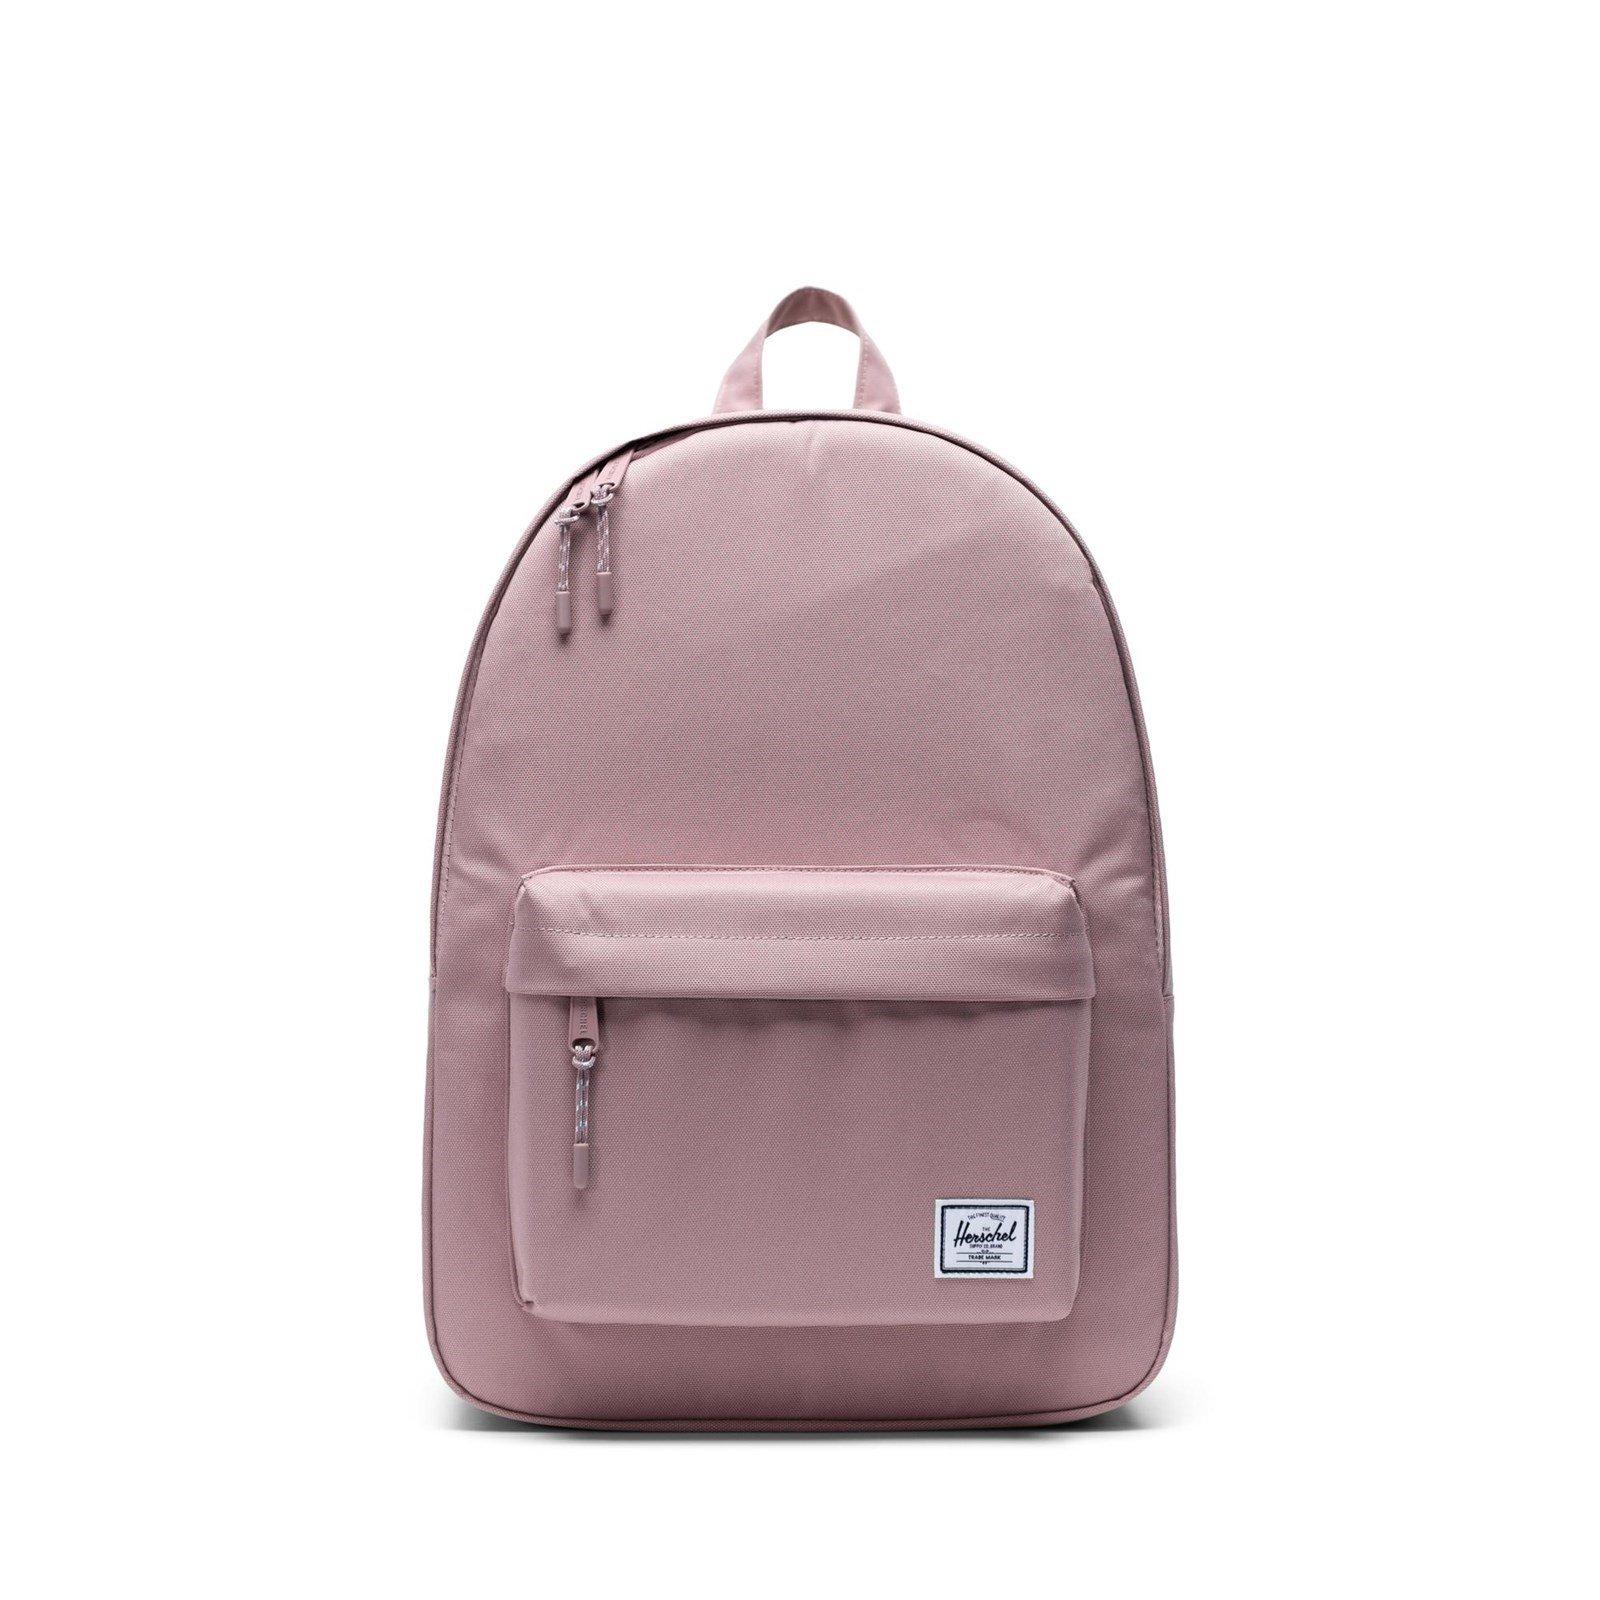 Herschel Women's Classic Backpack Various Colours 33599 - Ash Rose Itm